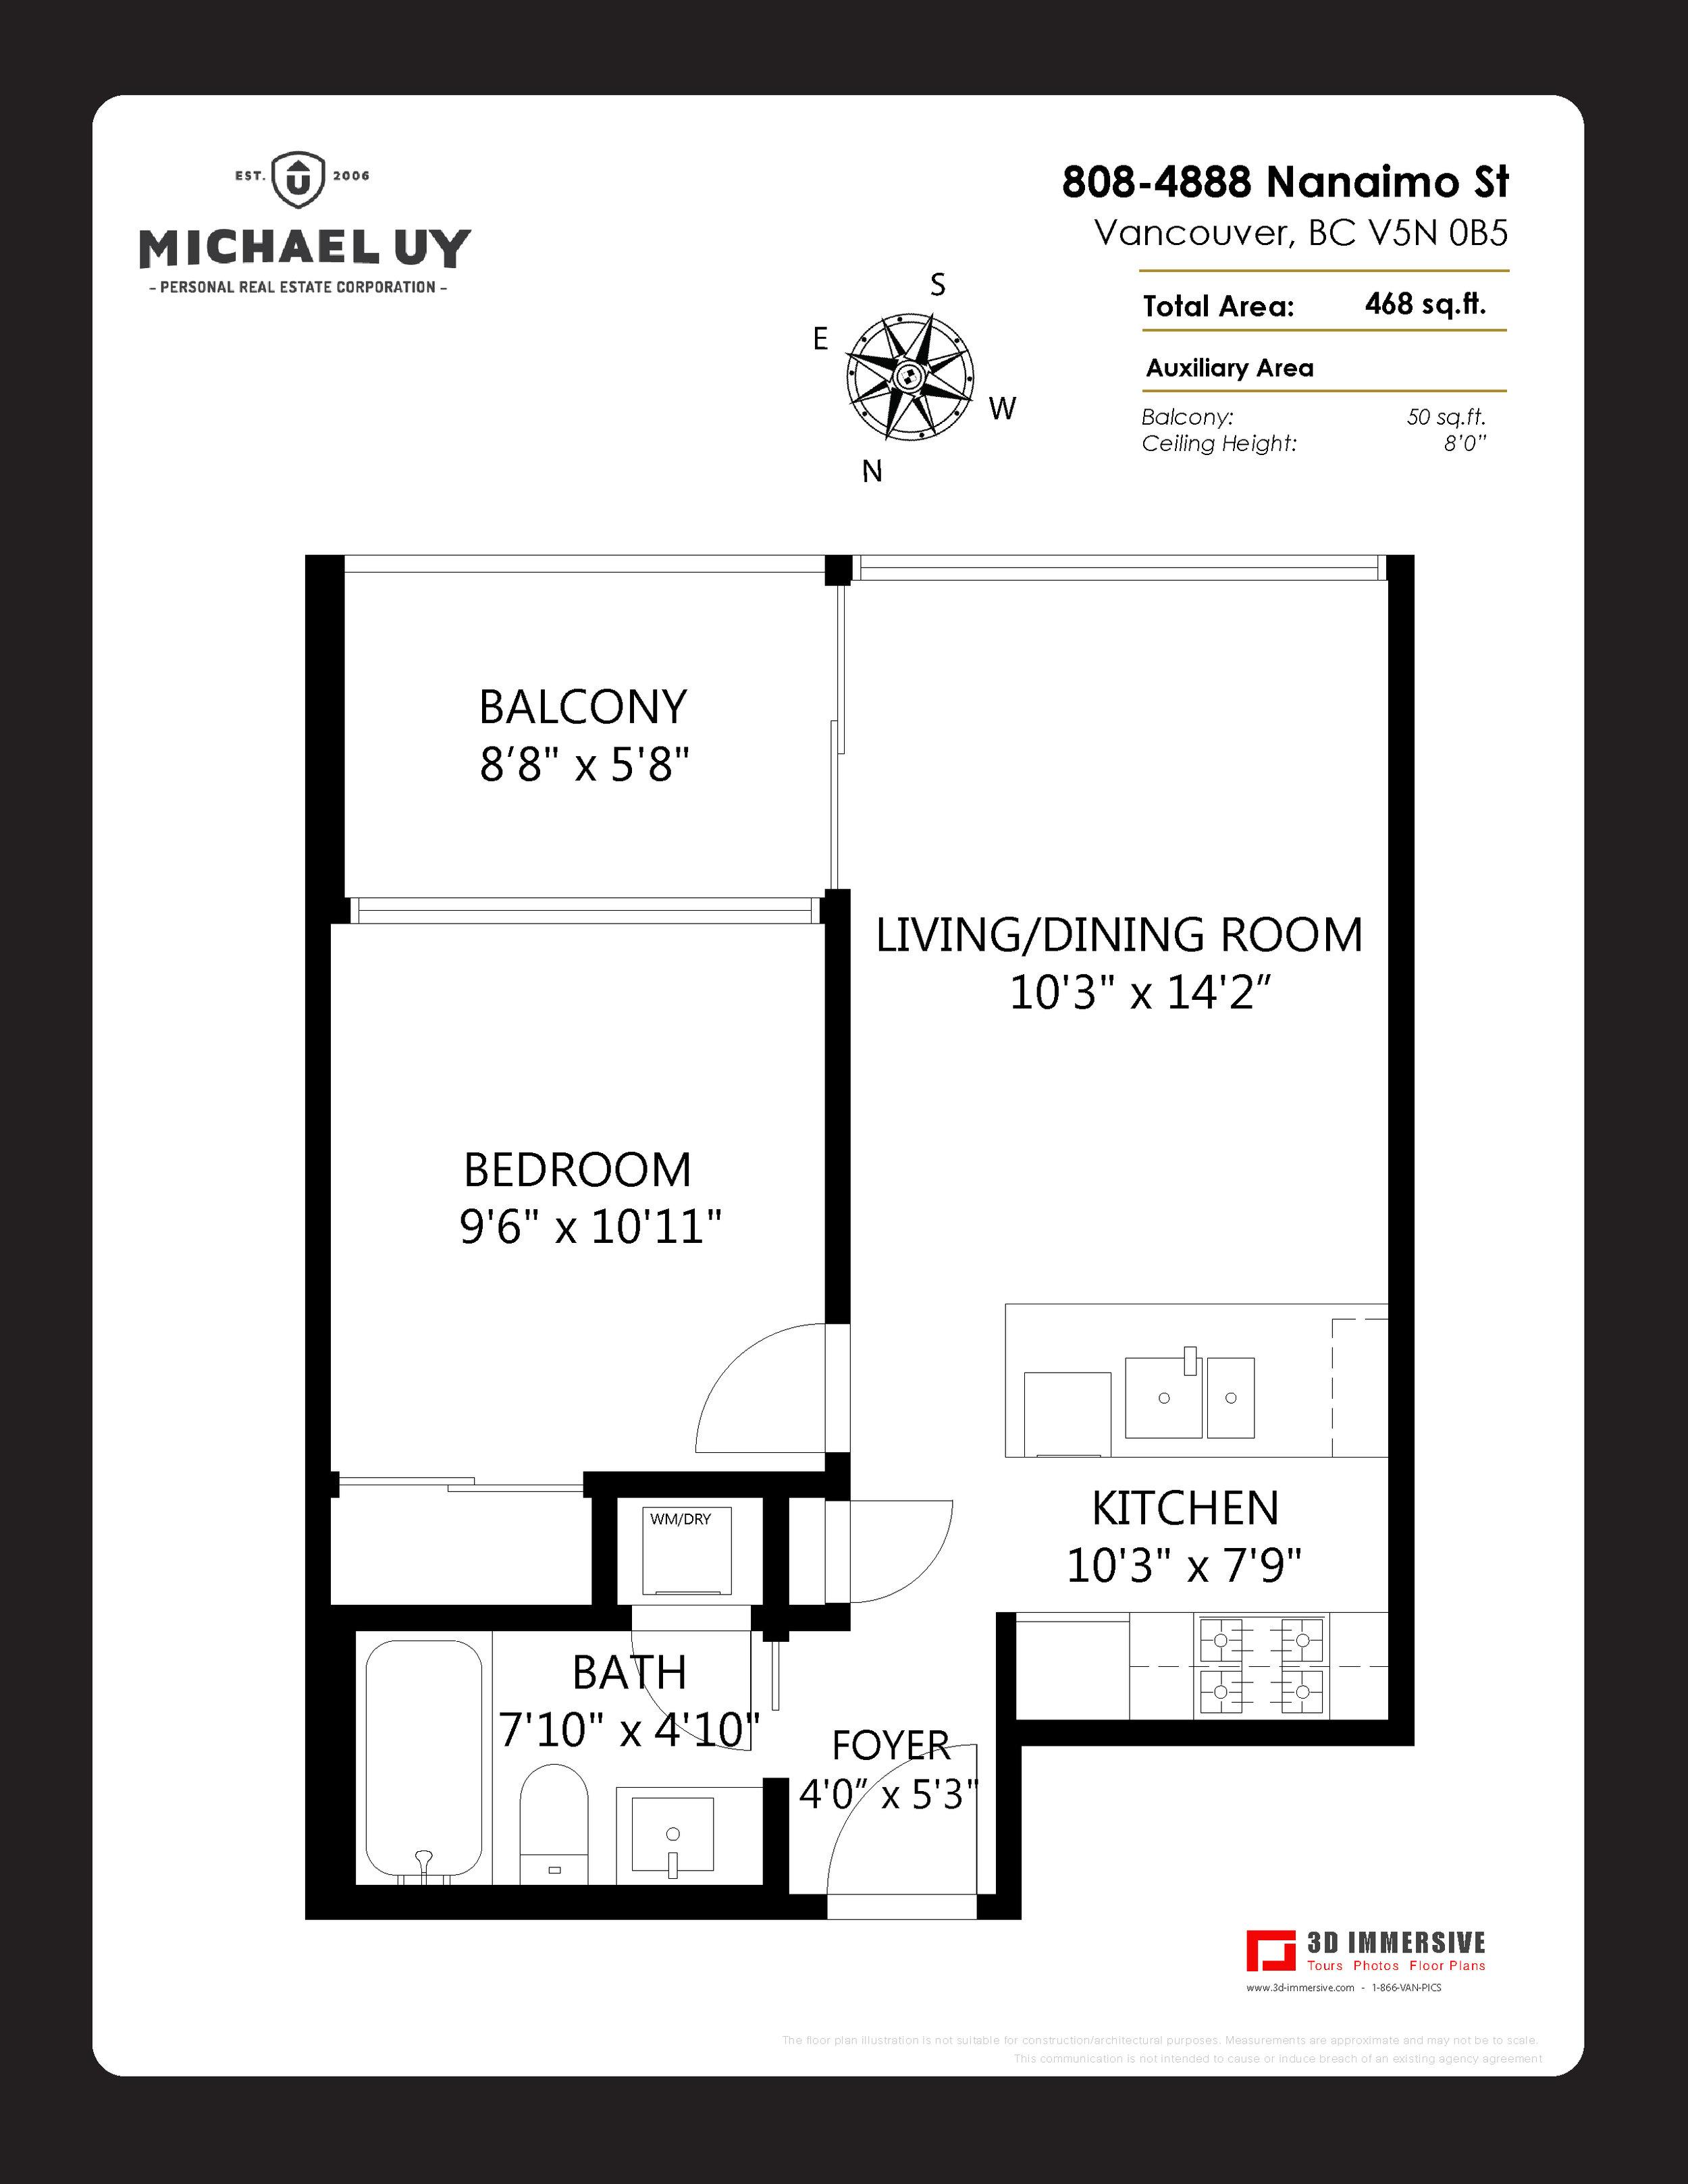 808-4888 Nanaimo St. - Branded Floor Plan.jpg